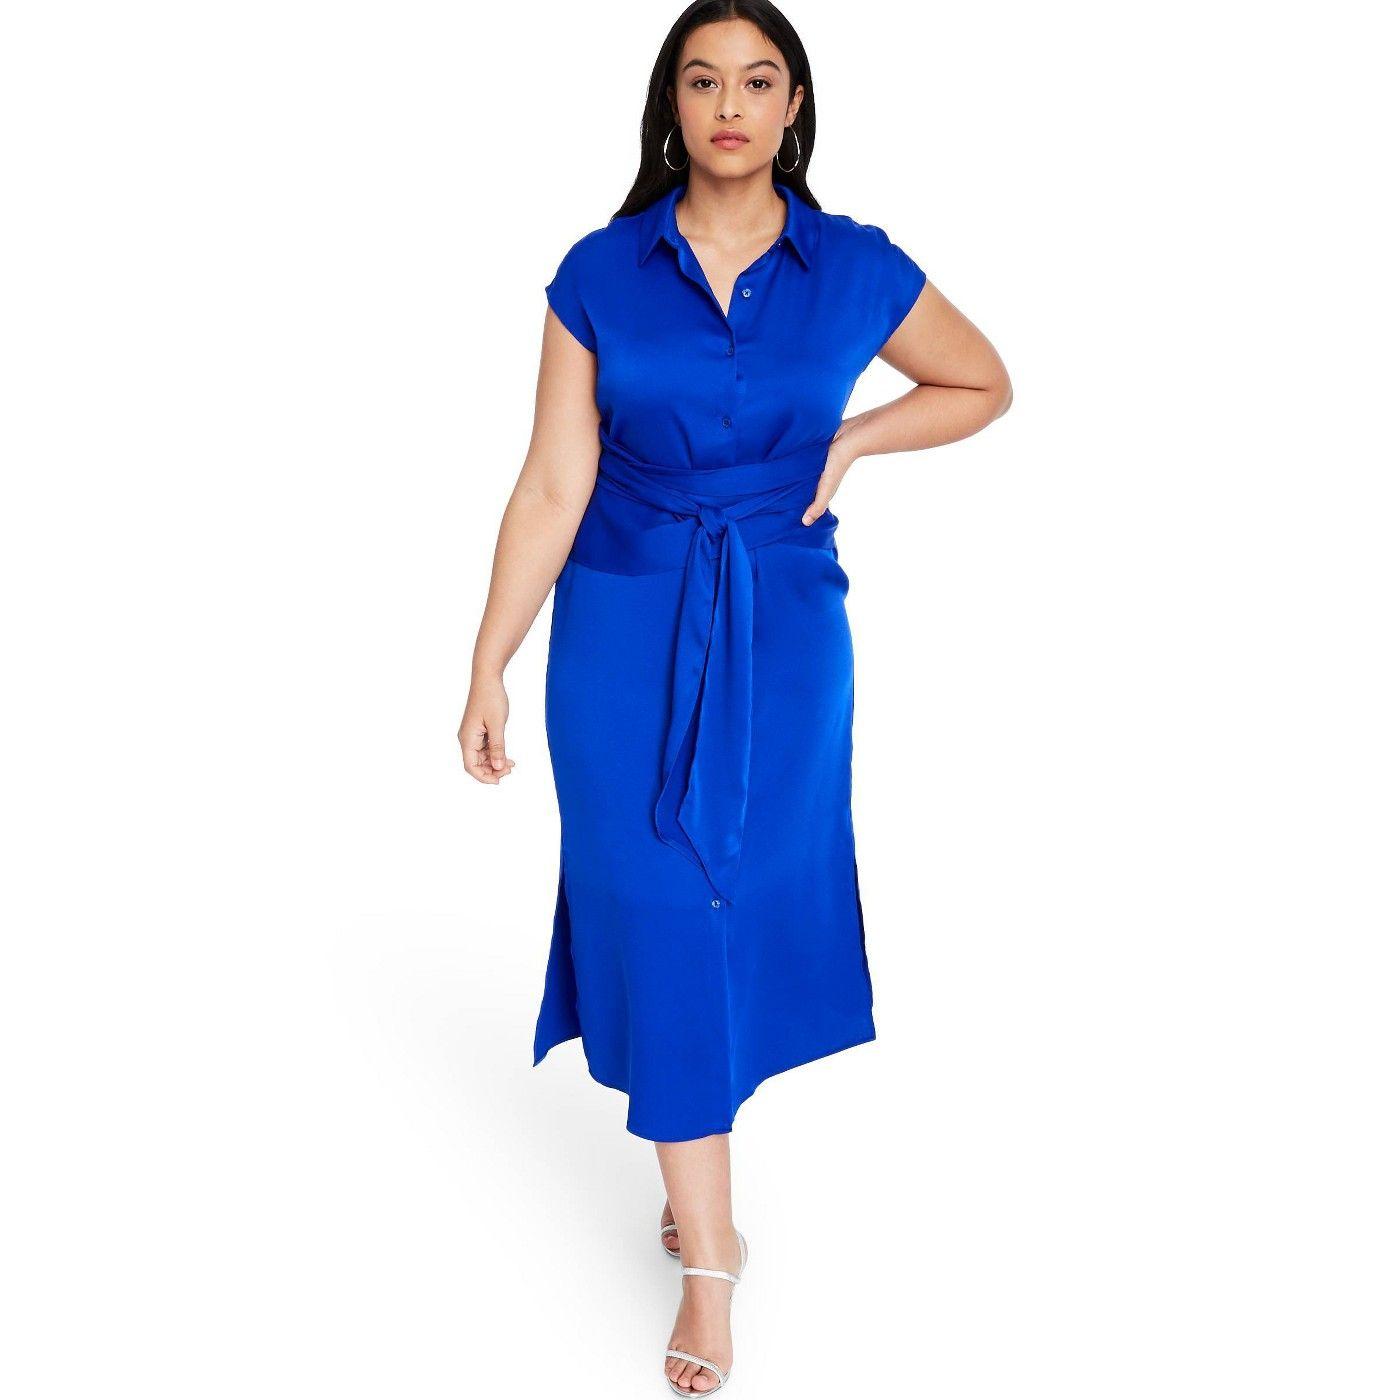 Women S Tie Front Shirtdress Cushnie For Target Regular Plus Royal Blue Sponsored Front Affiliate S Womens Sleeveless Dress Womens Tie Casual Dress [ 1400 x 1400 Pixel ]